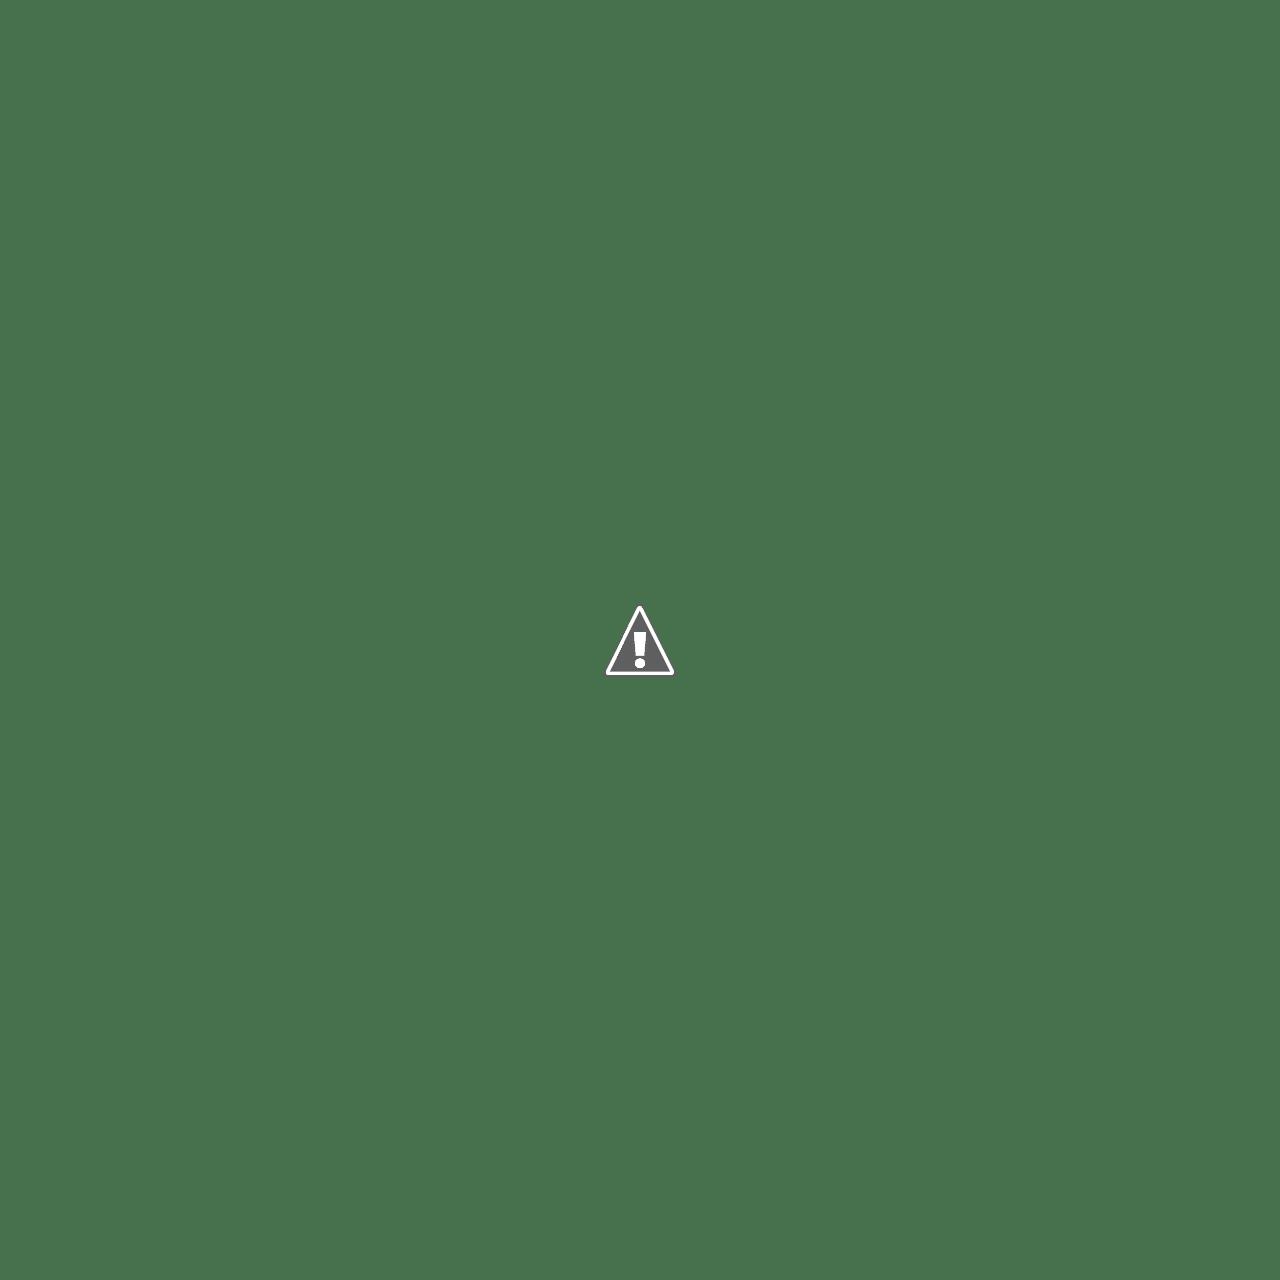 Agen Sabun Gove Tangerang Pemasok Produk Kecantikan Eceran Original Diposting Pada 26 Sep 18